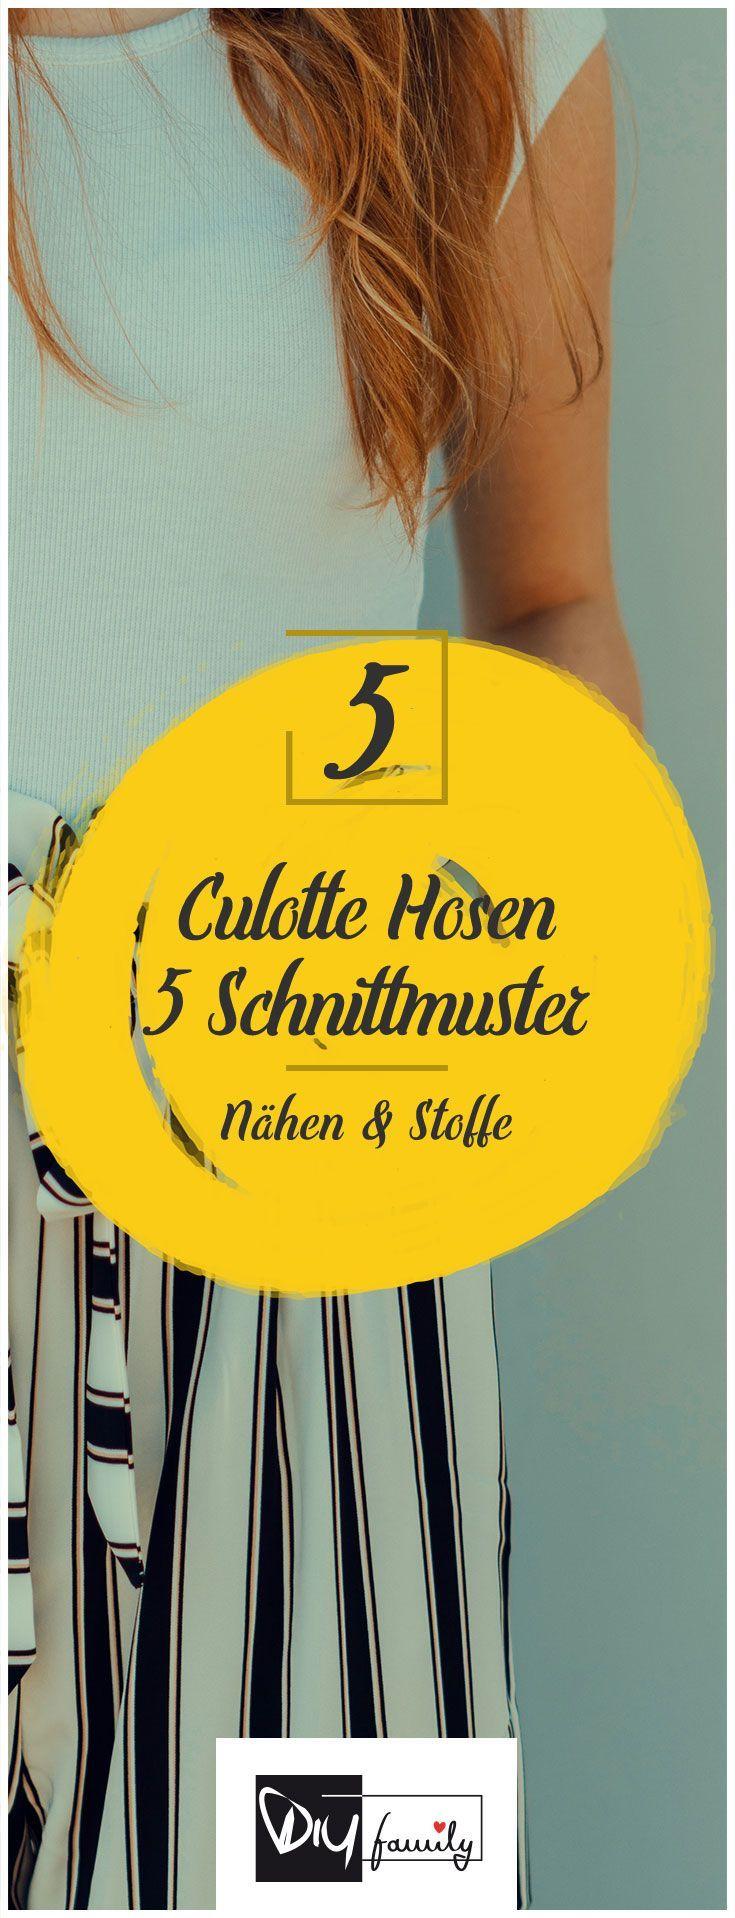 Culotte-Hosen – 5 abwechslungsreiche Schnittmuster